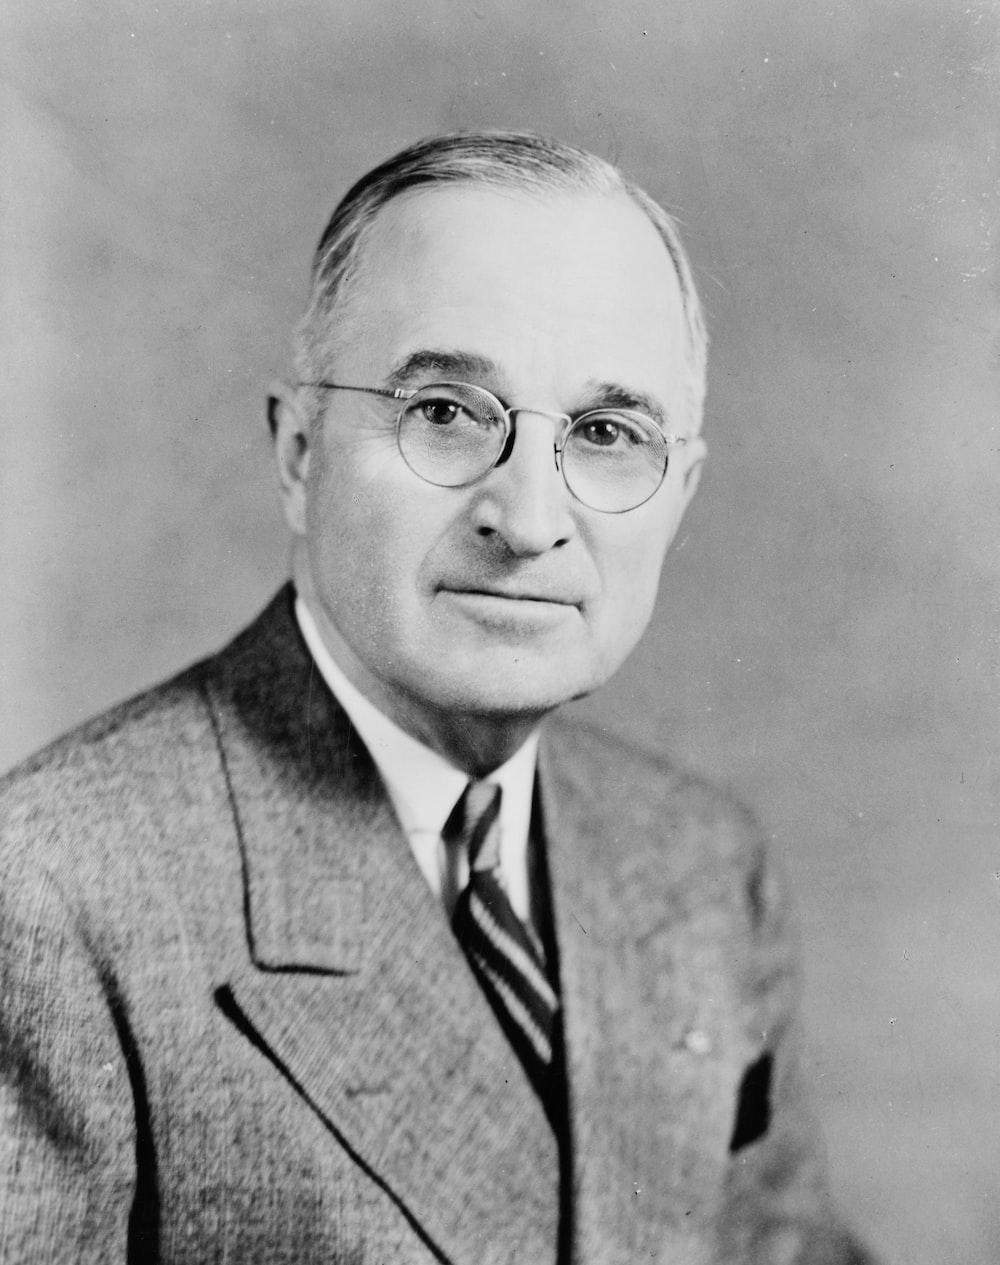 President Harry Truman